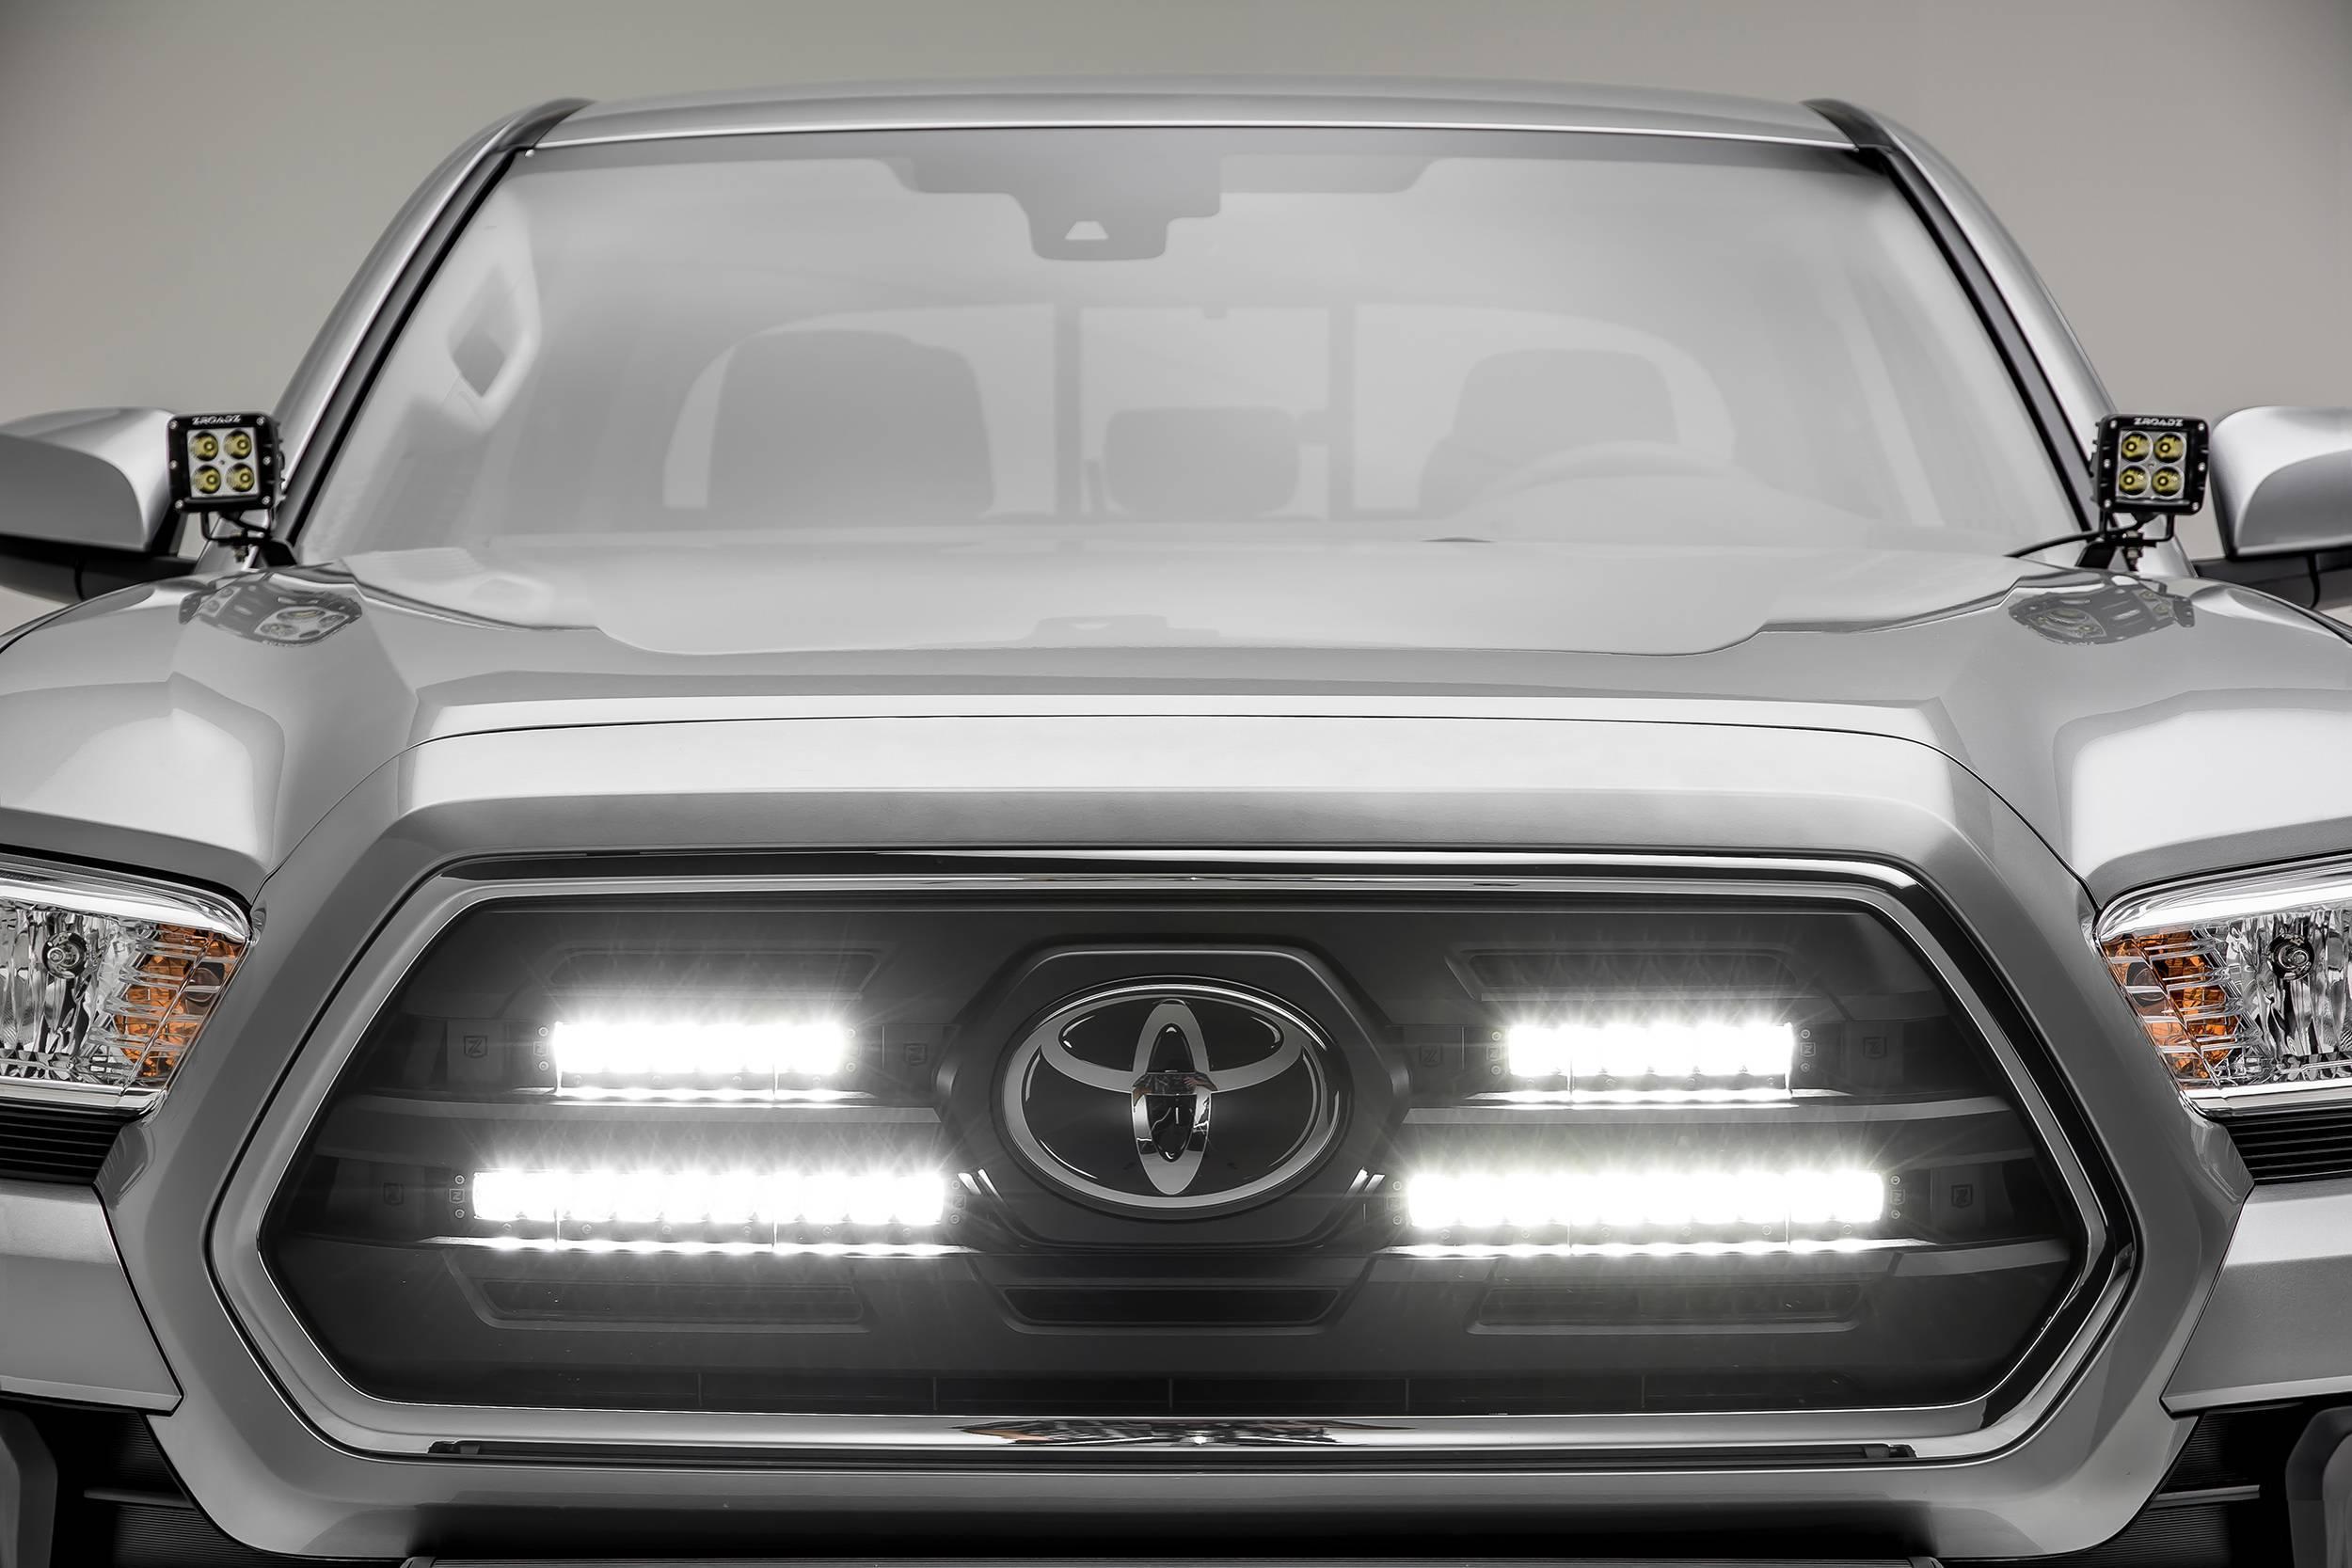 ZROADZ - 2018-2019 Toyota Tacoma OEM Grille LED Kit with (2) 6 Inch and (2) 10 Inch LED Straight Single Row Slim Light Bars - PN #Z419711-KIT